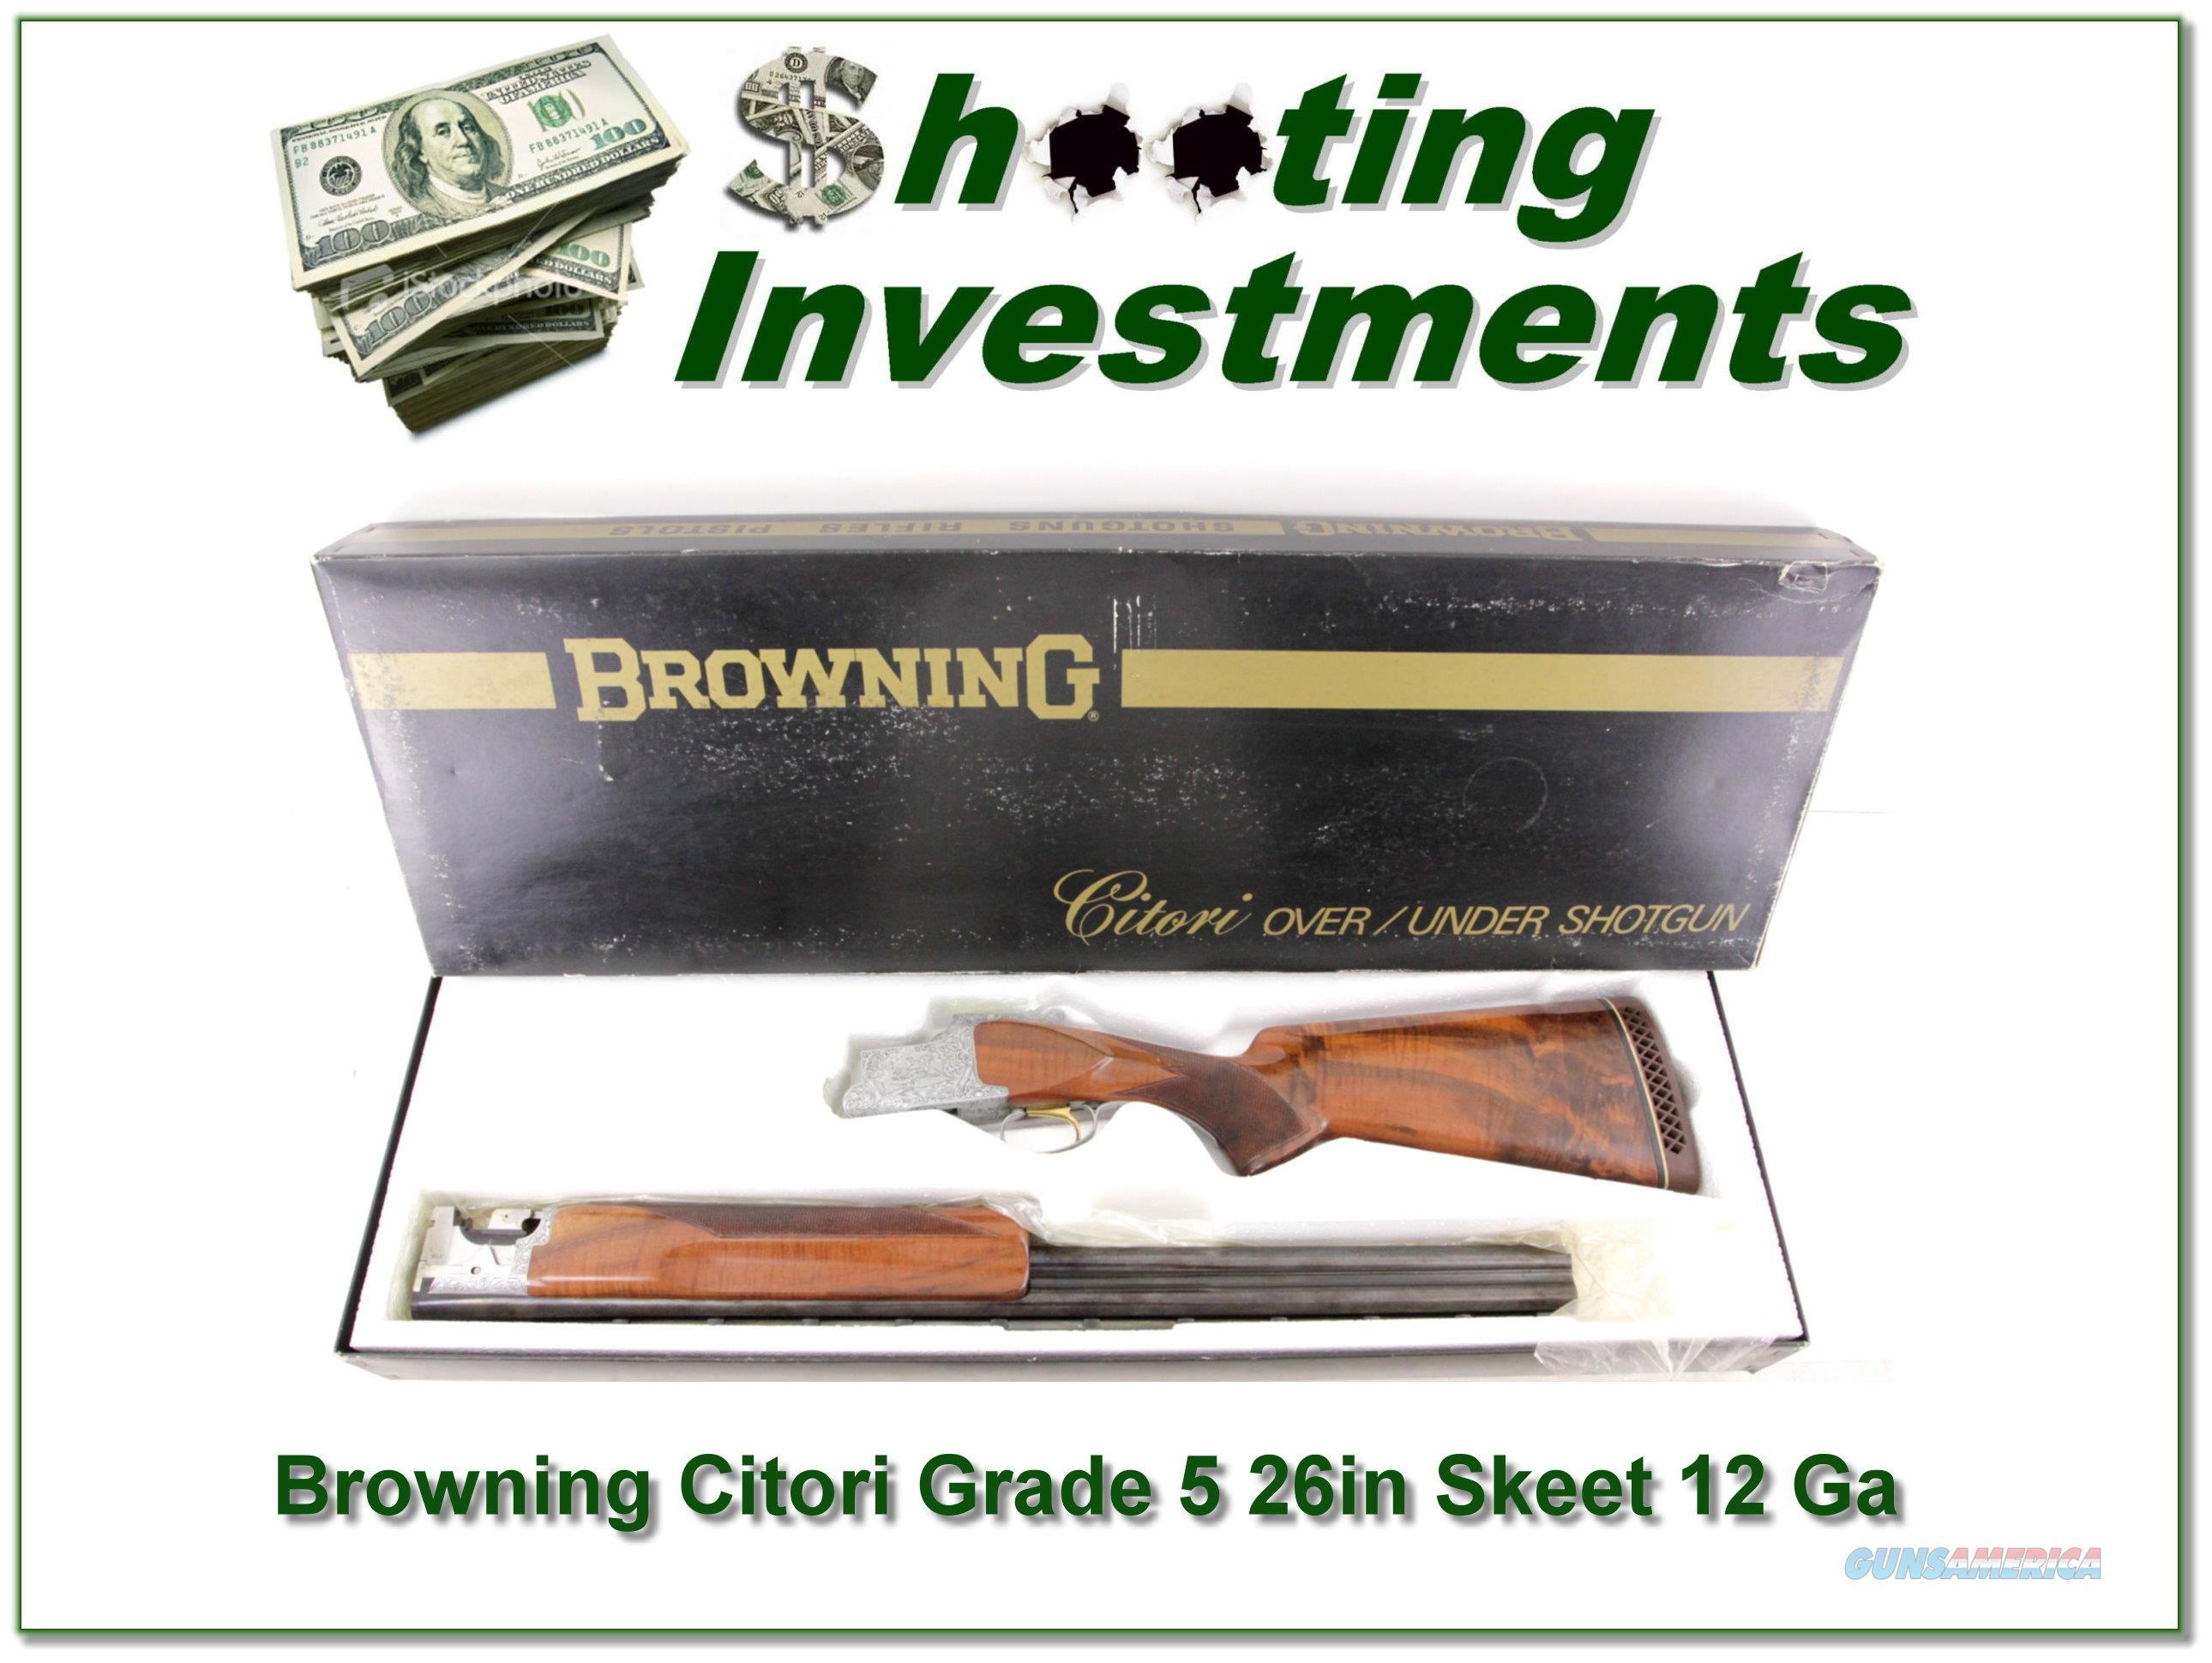 Browning Citori Grade 5 collector ANIB 12 Ga Skeet  Guns > Shotguns > Browning Shotguns > Over Unders > Citori > Hunting